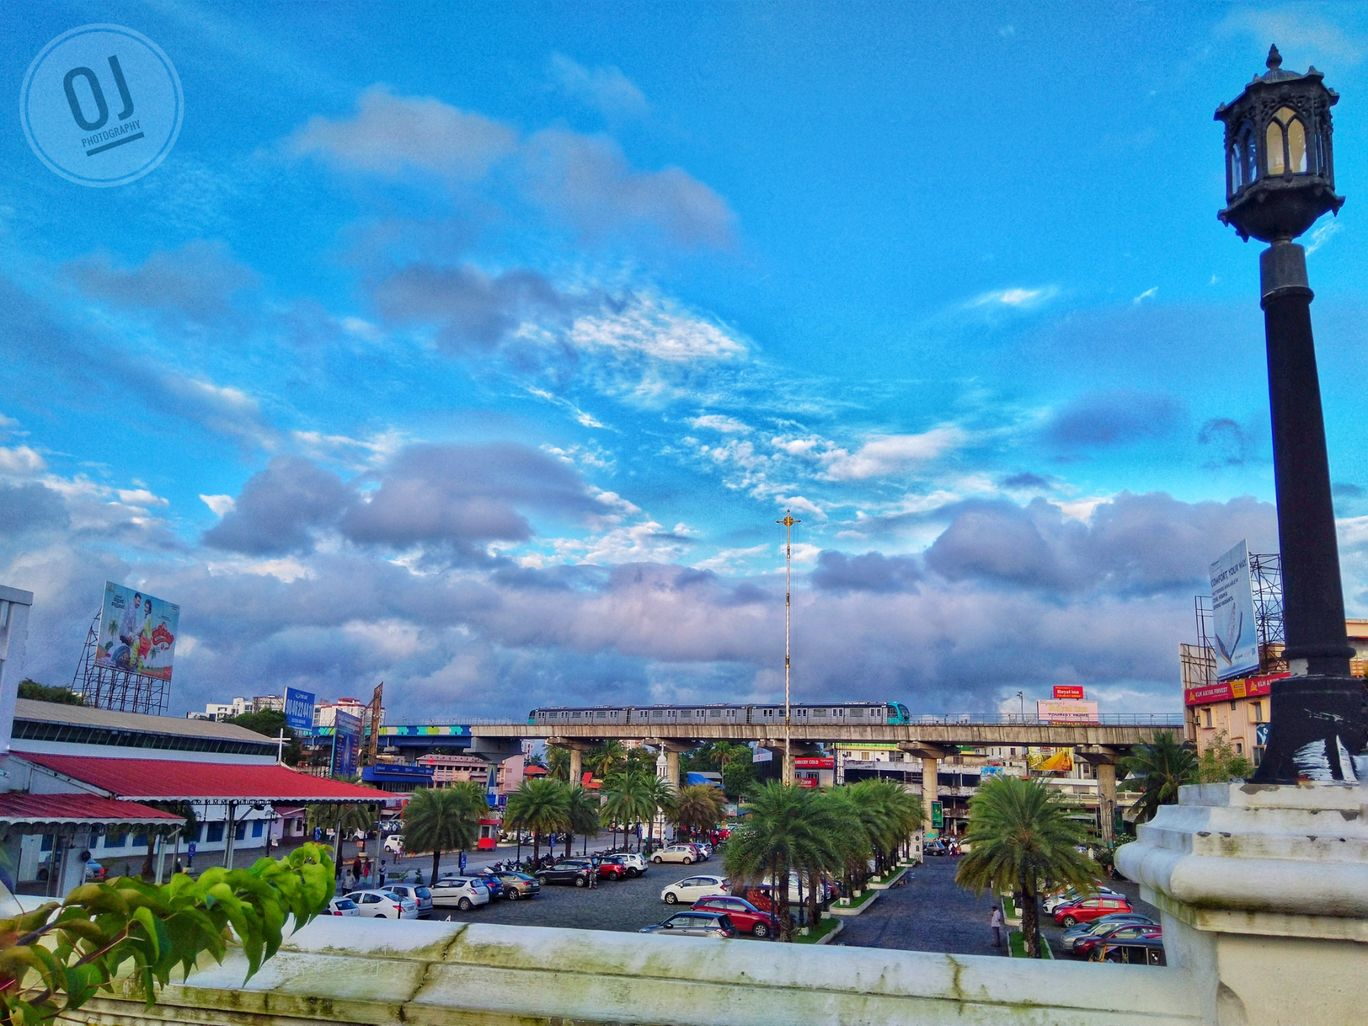 Photo of Edappally Metro Station By JOBIT OJ